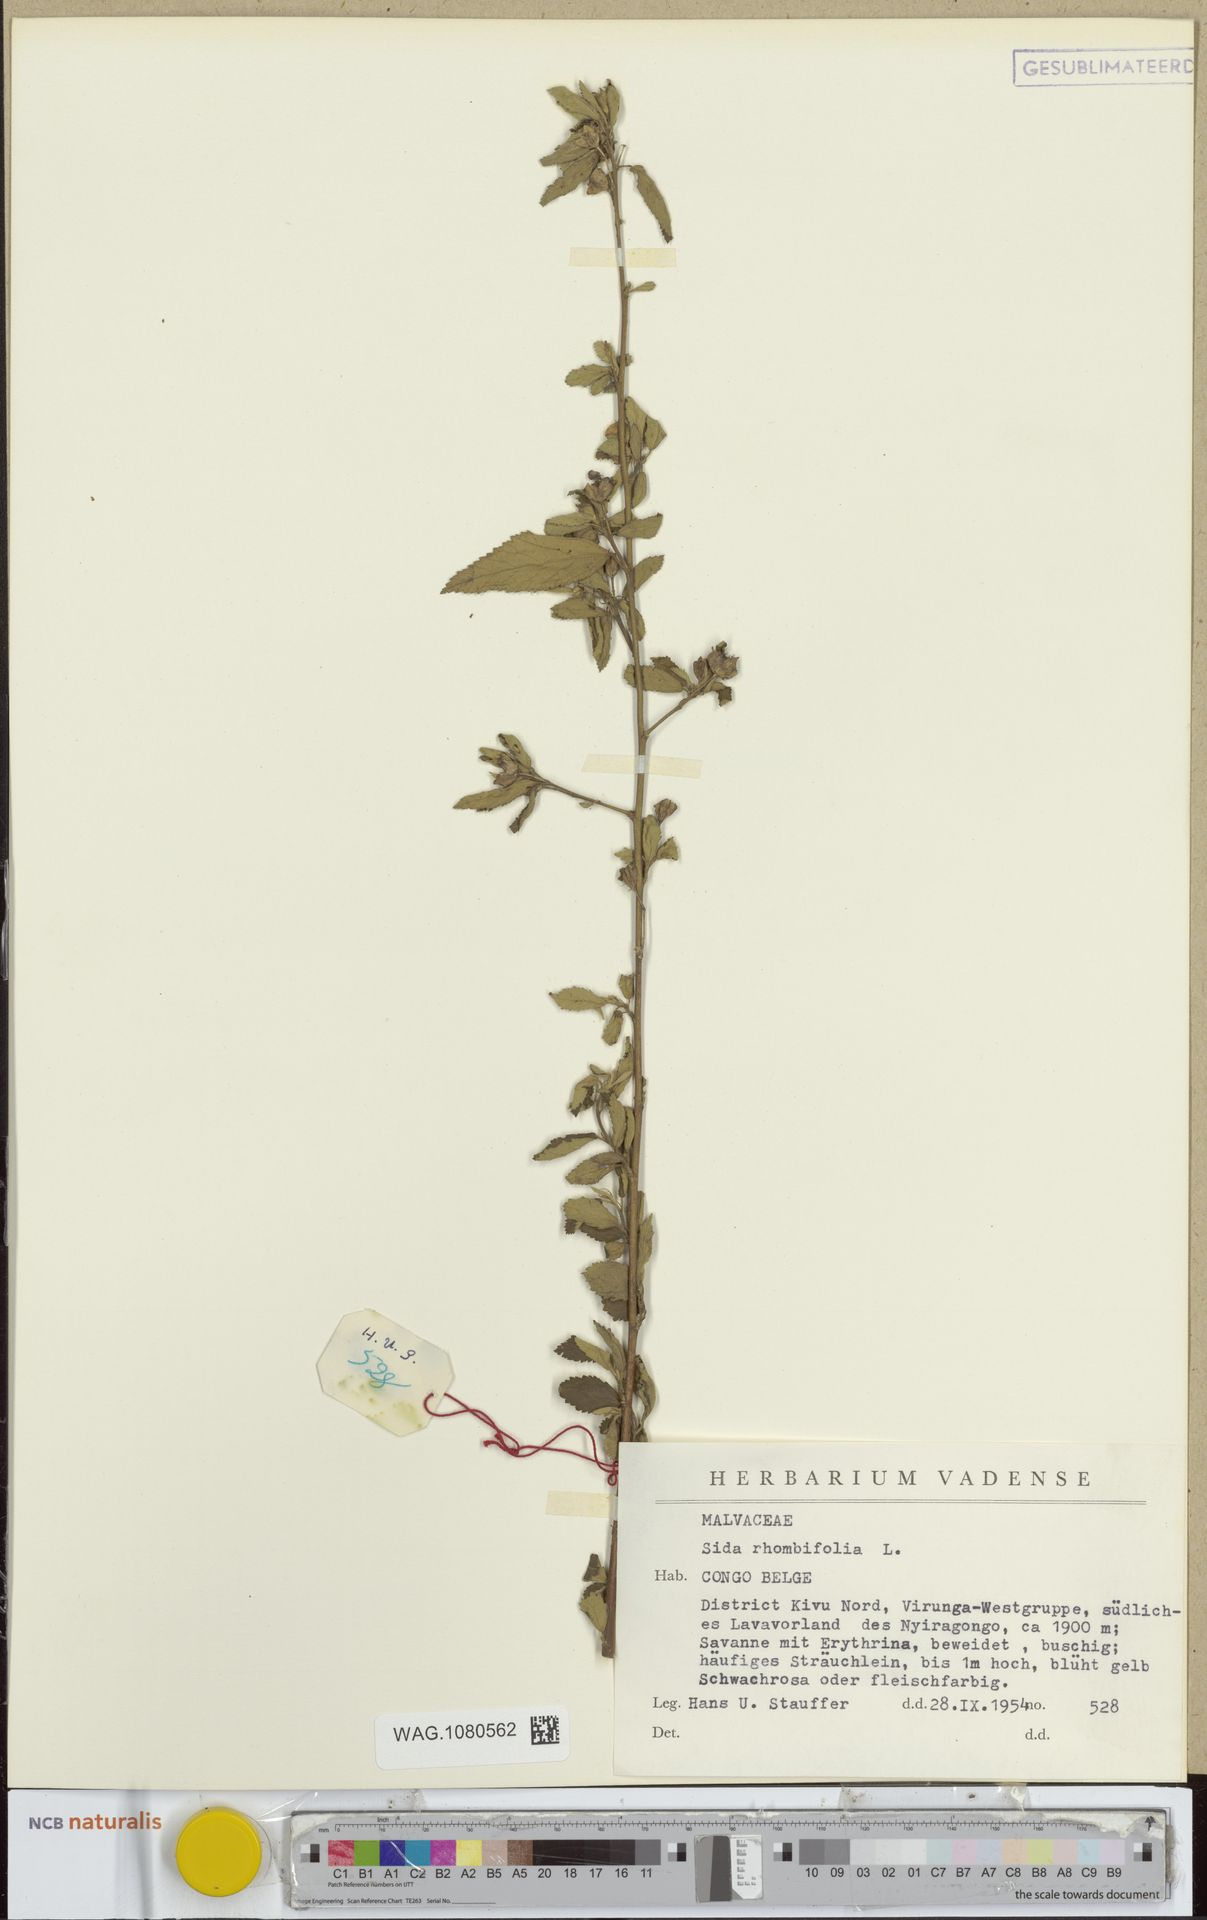 WAG.1080562 | Sida rhombifolia L.